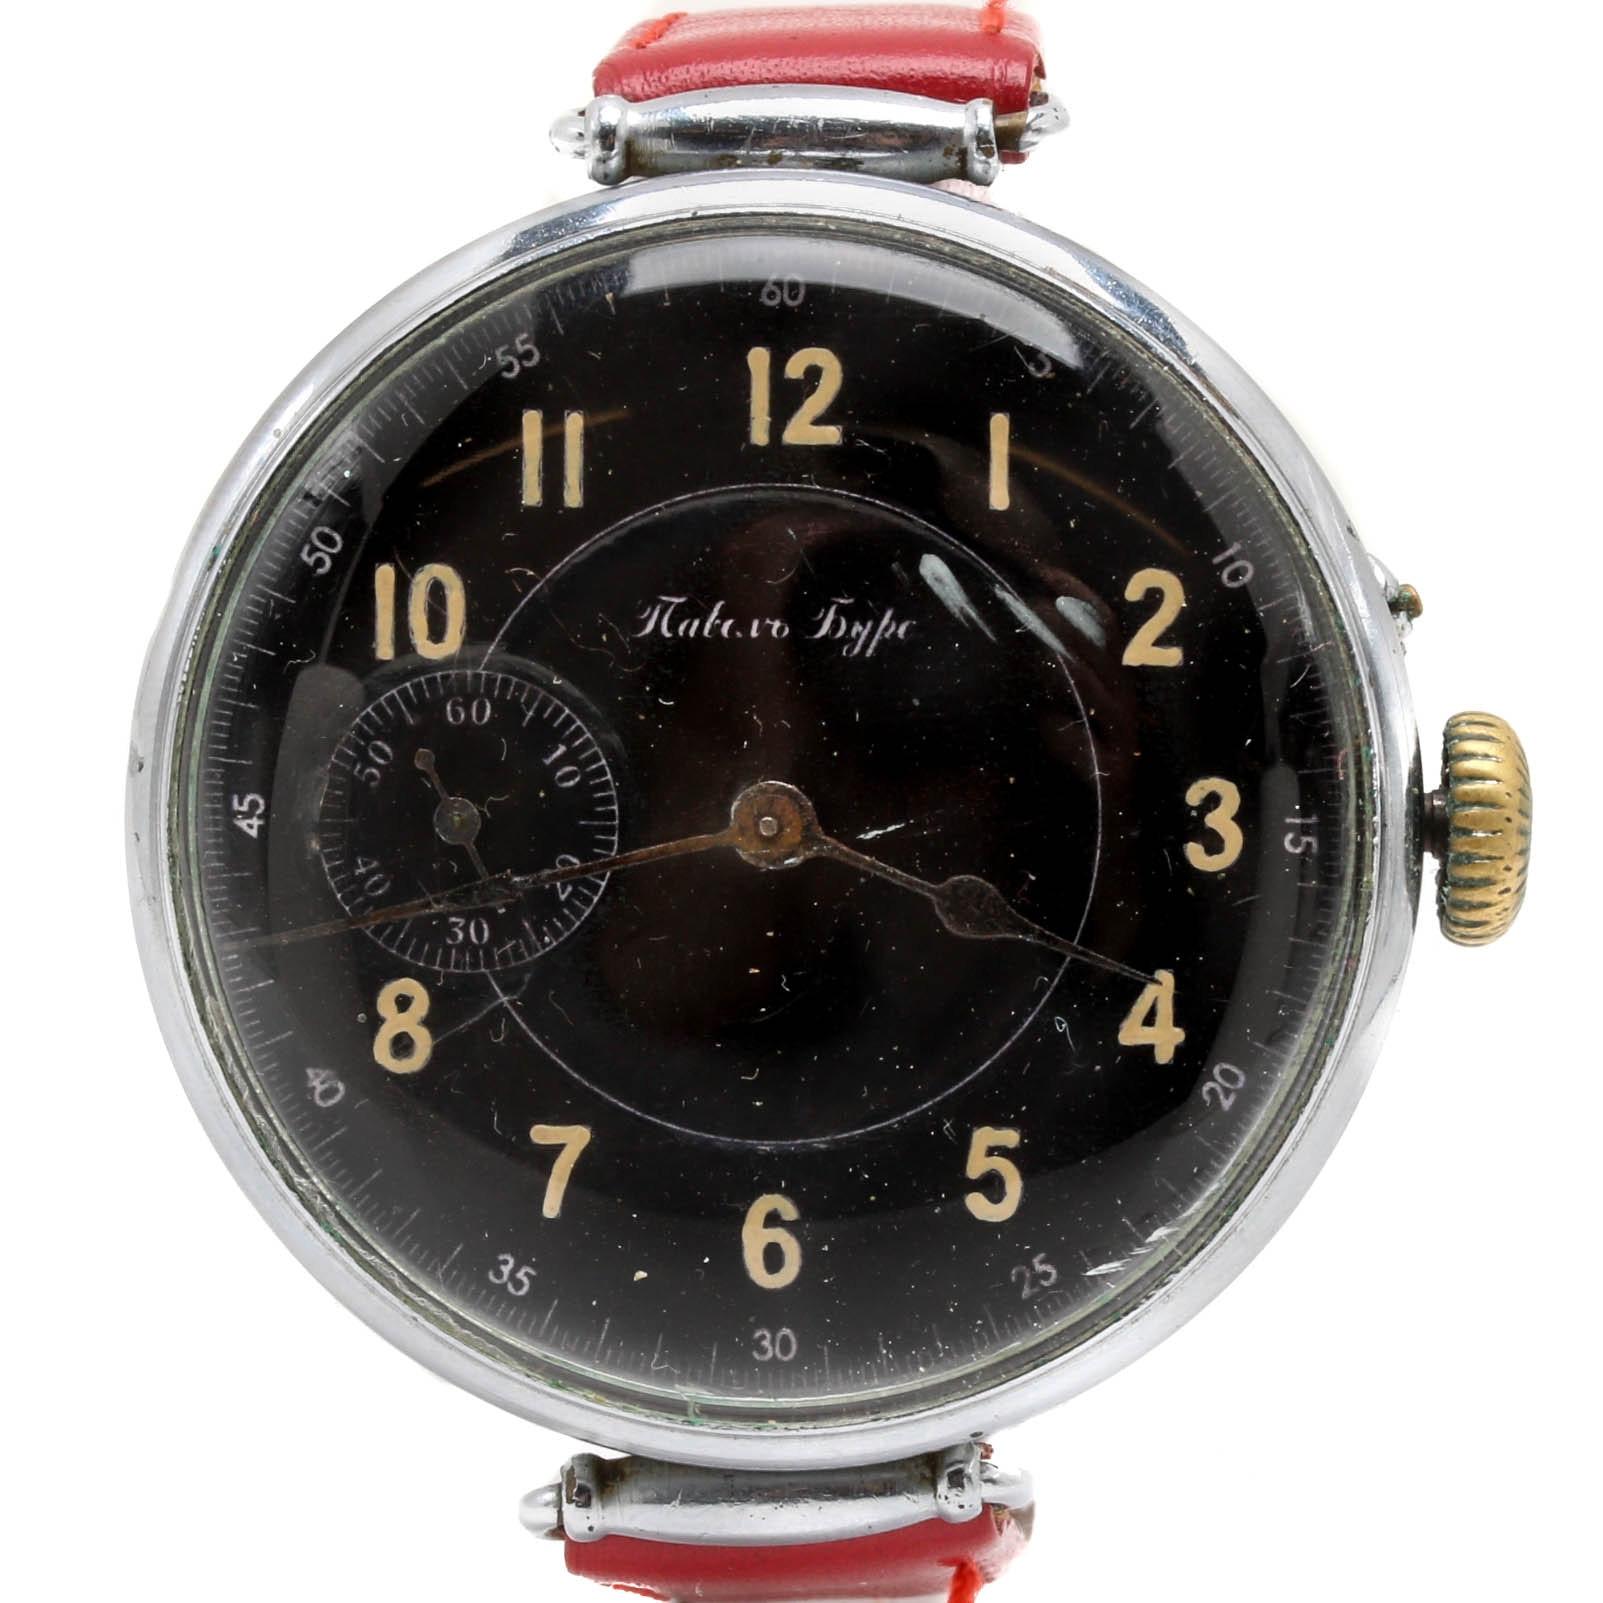 Vintage Pocket Watch Converted to Wristwatch